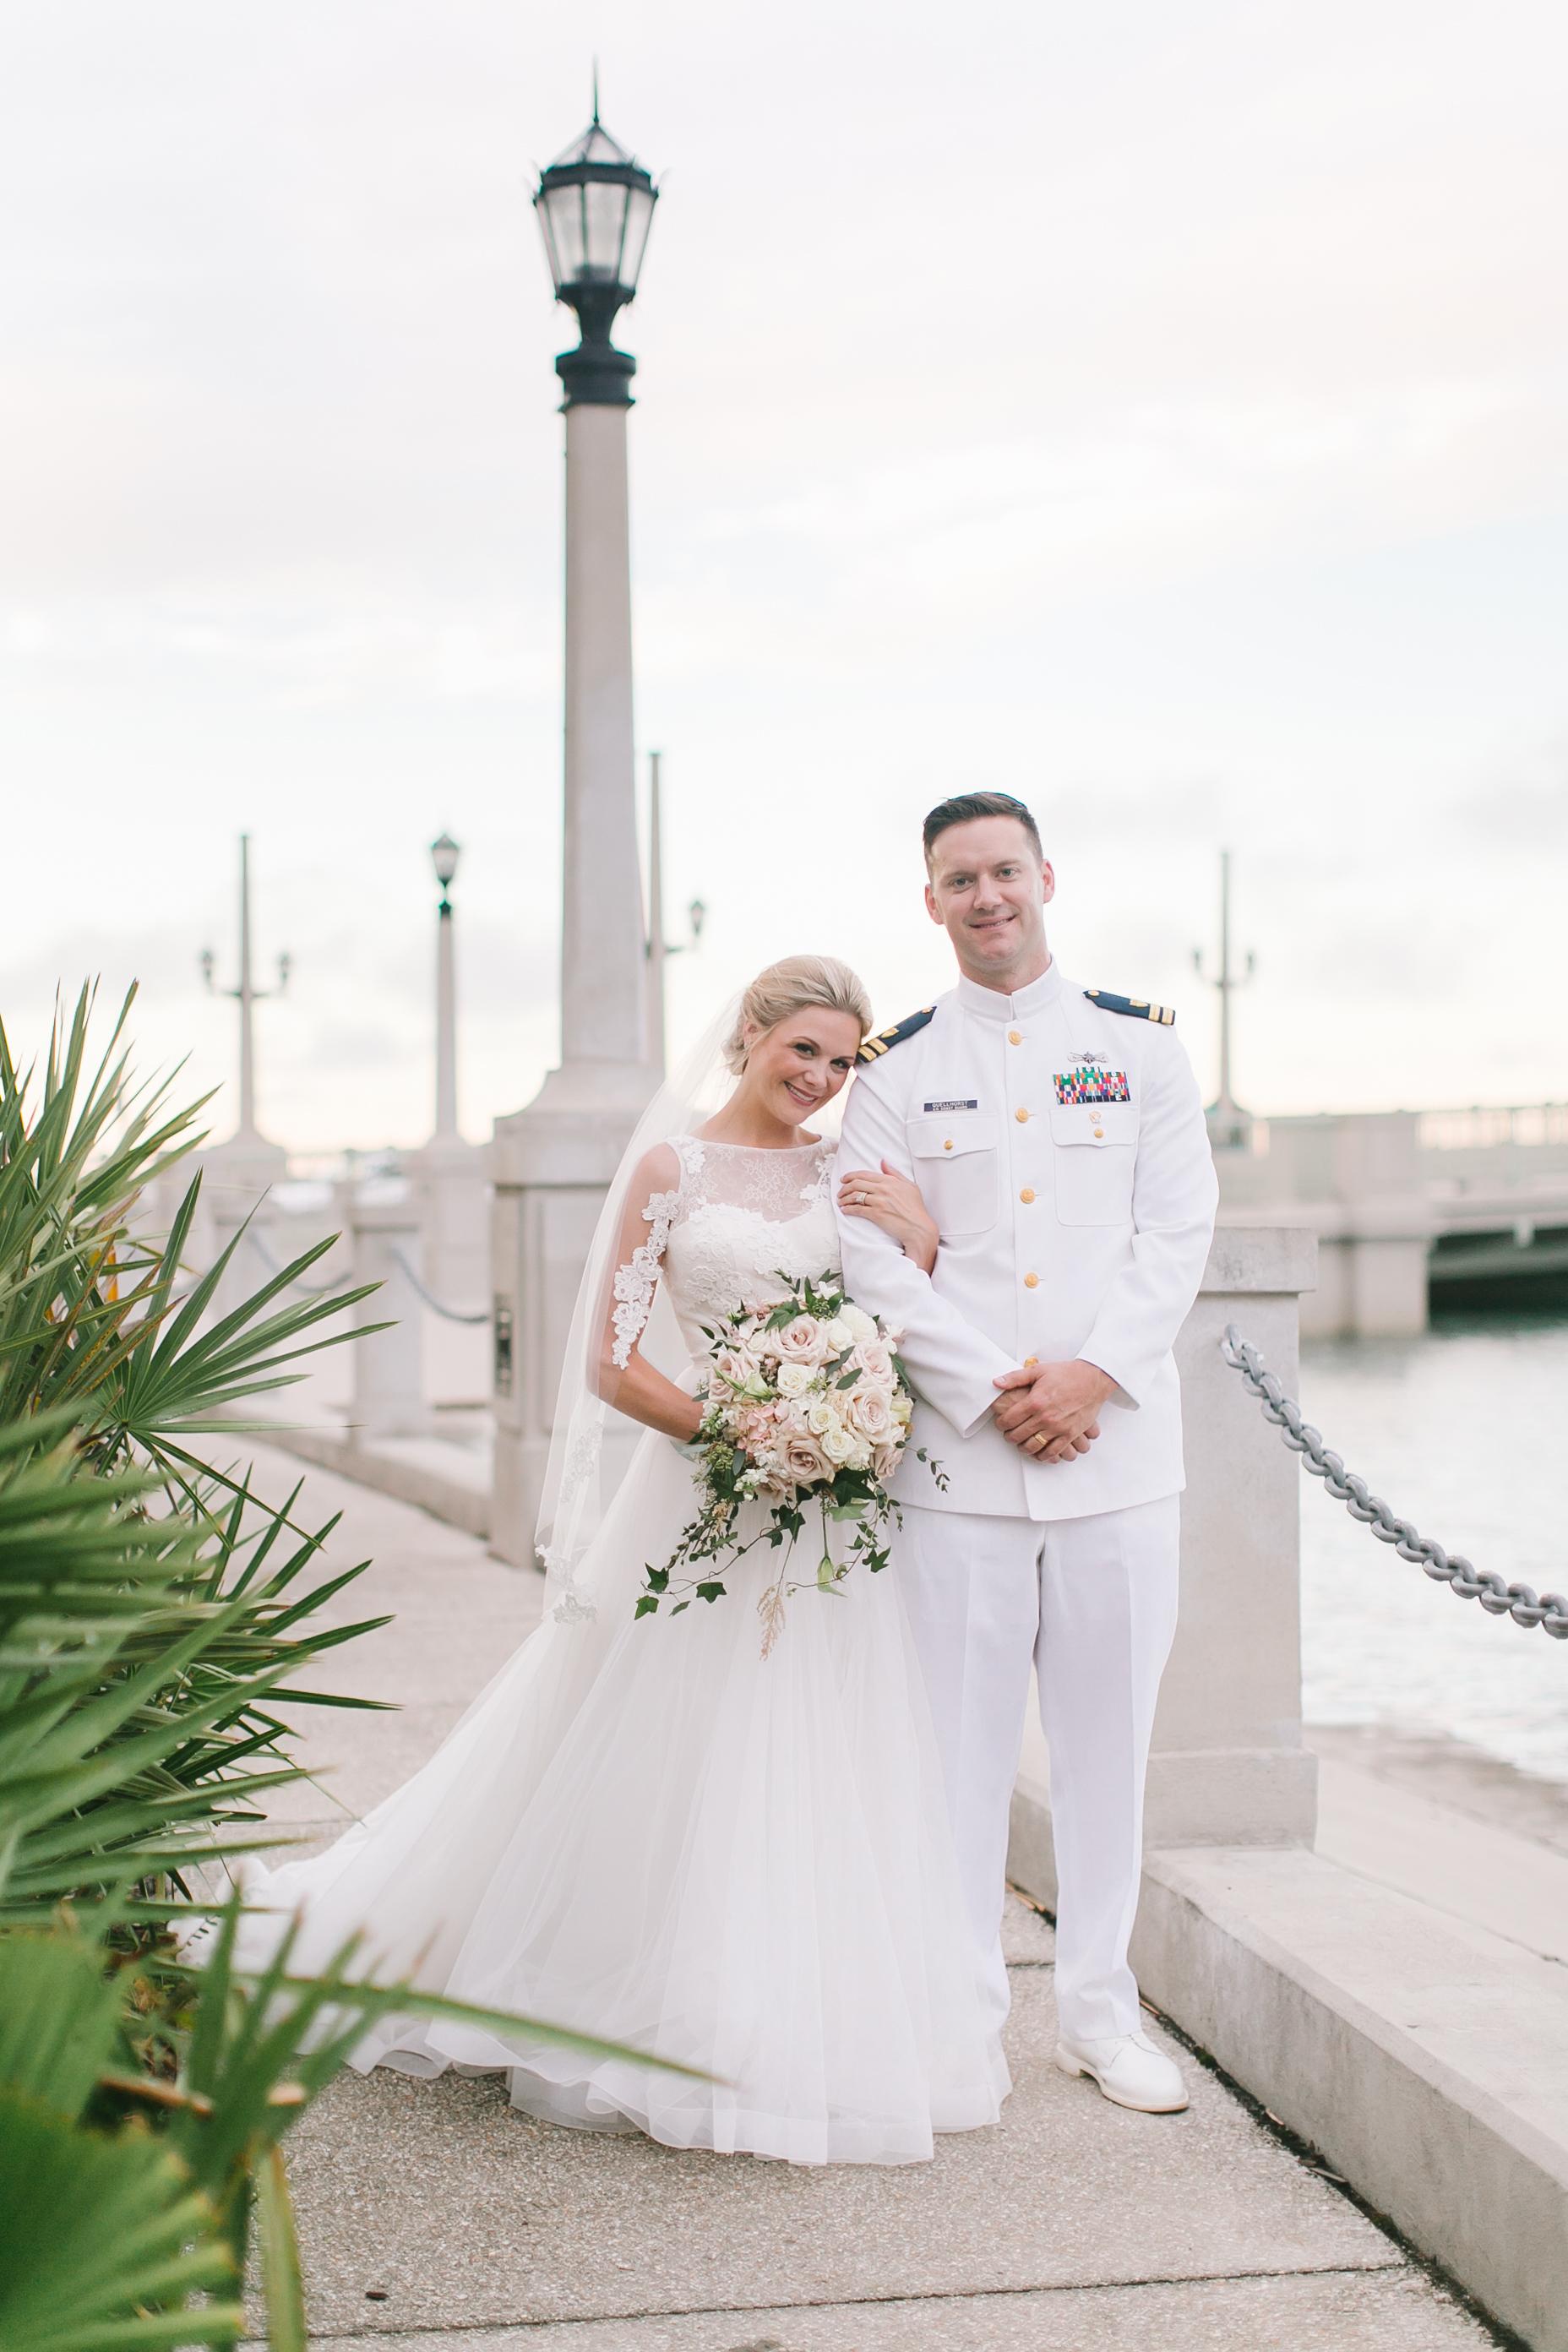 st-augustine-florida-wedding-venue-white-room-bridge-of-lions